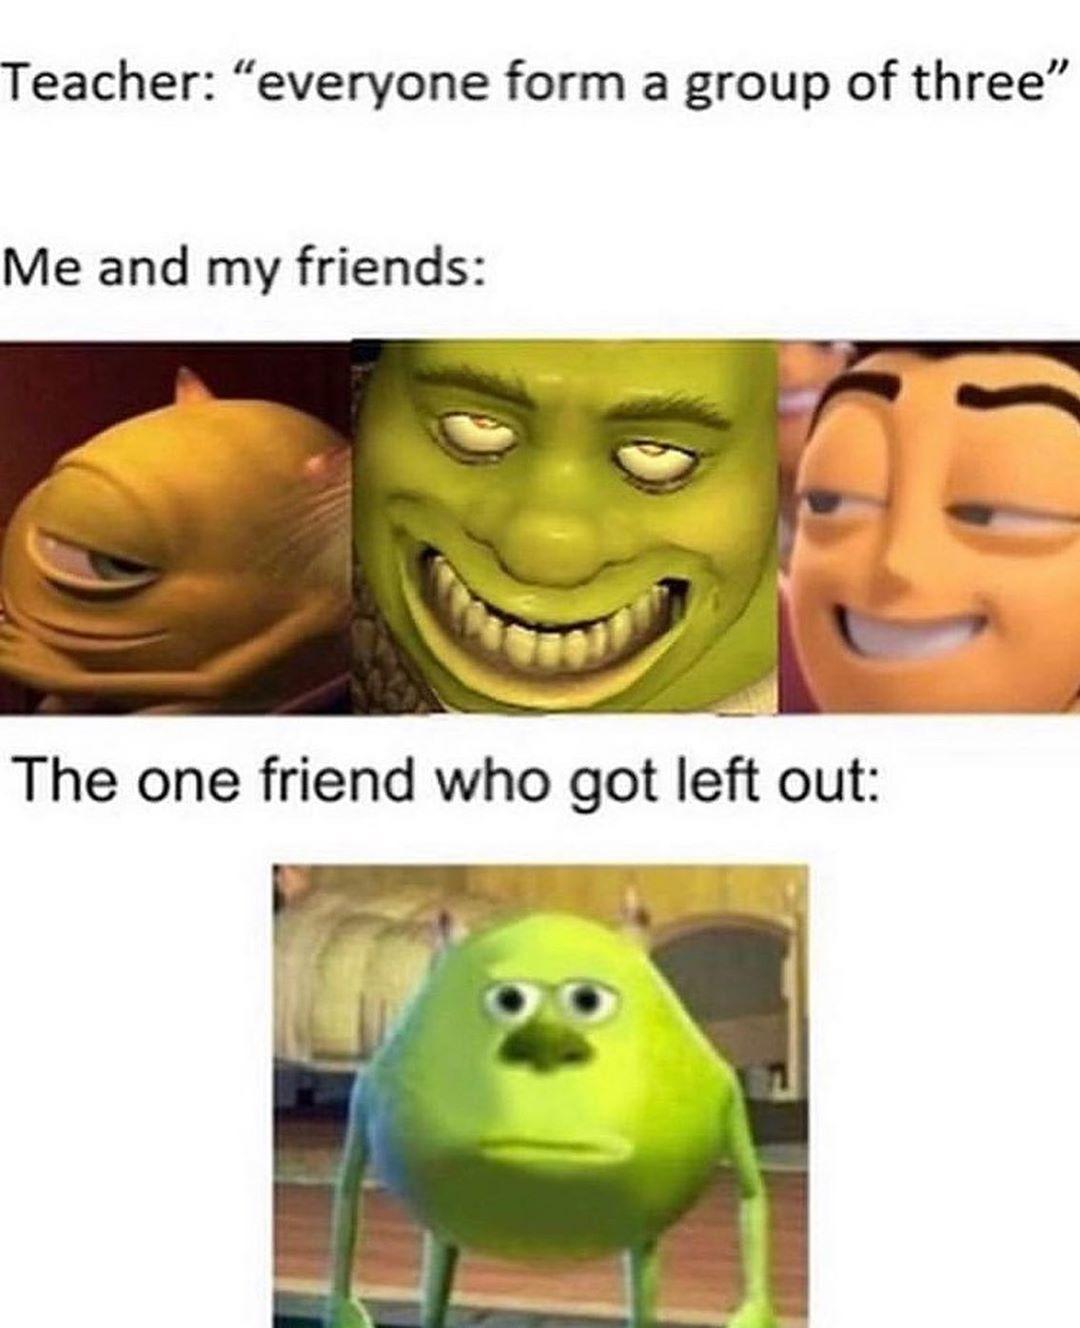 I was that one friend. - meme